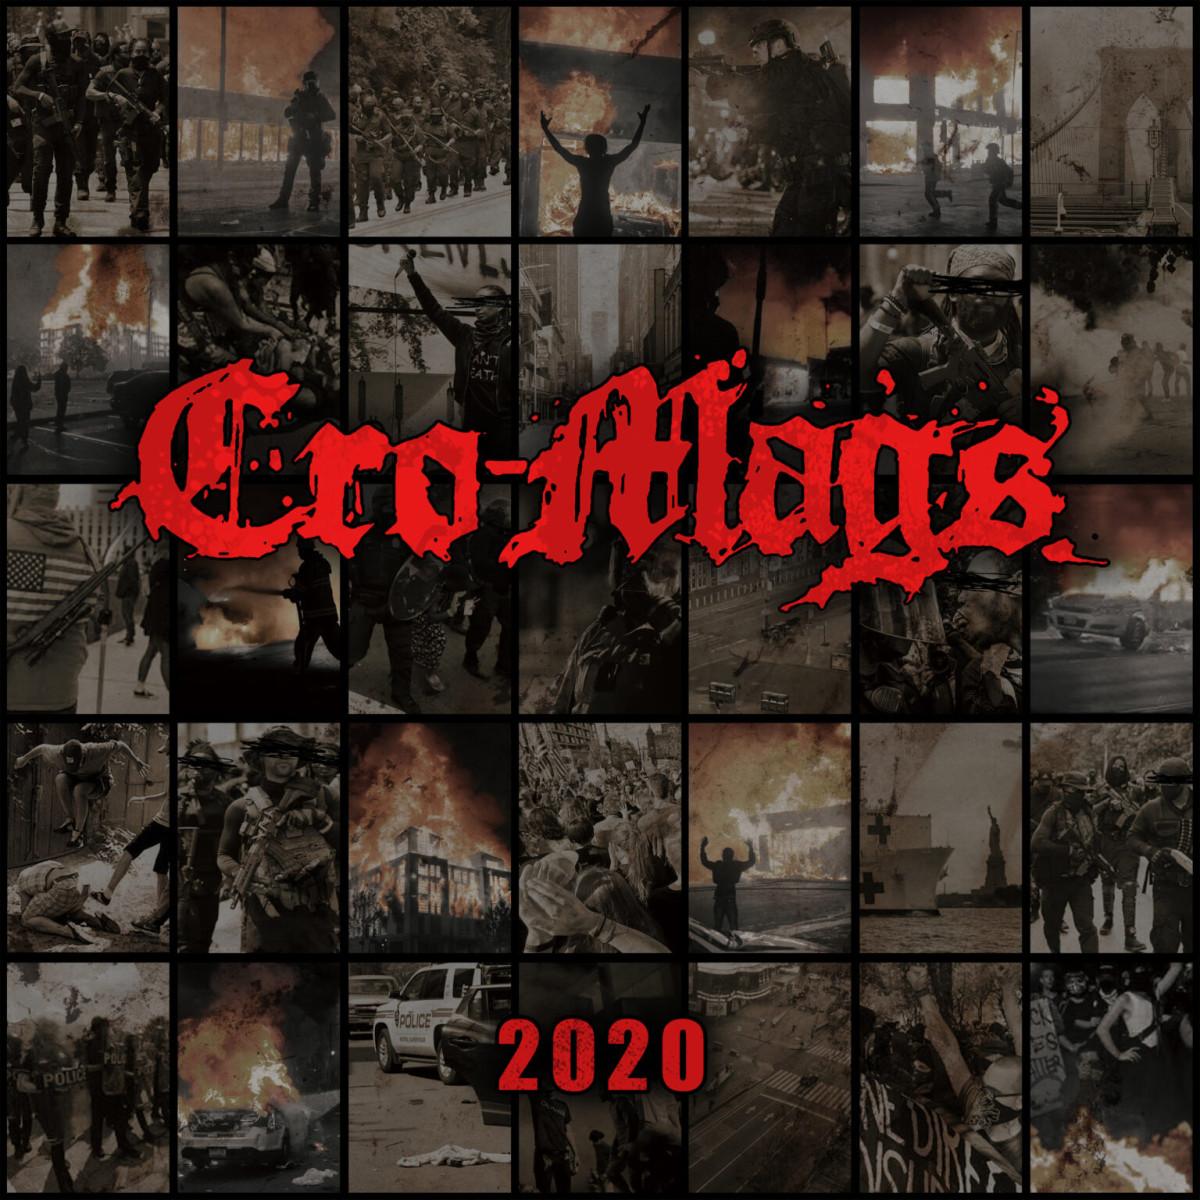 Cro-Mags-2020